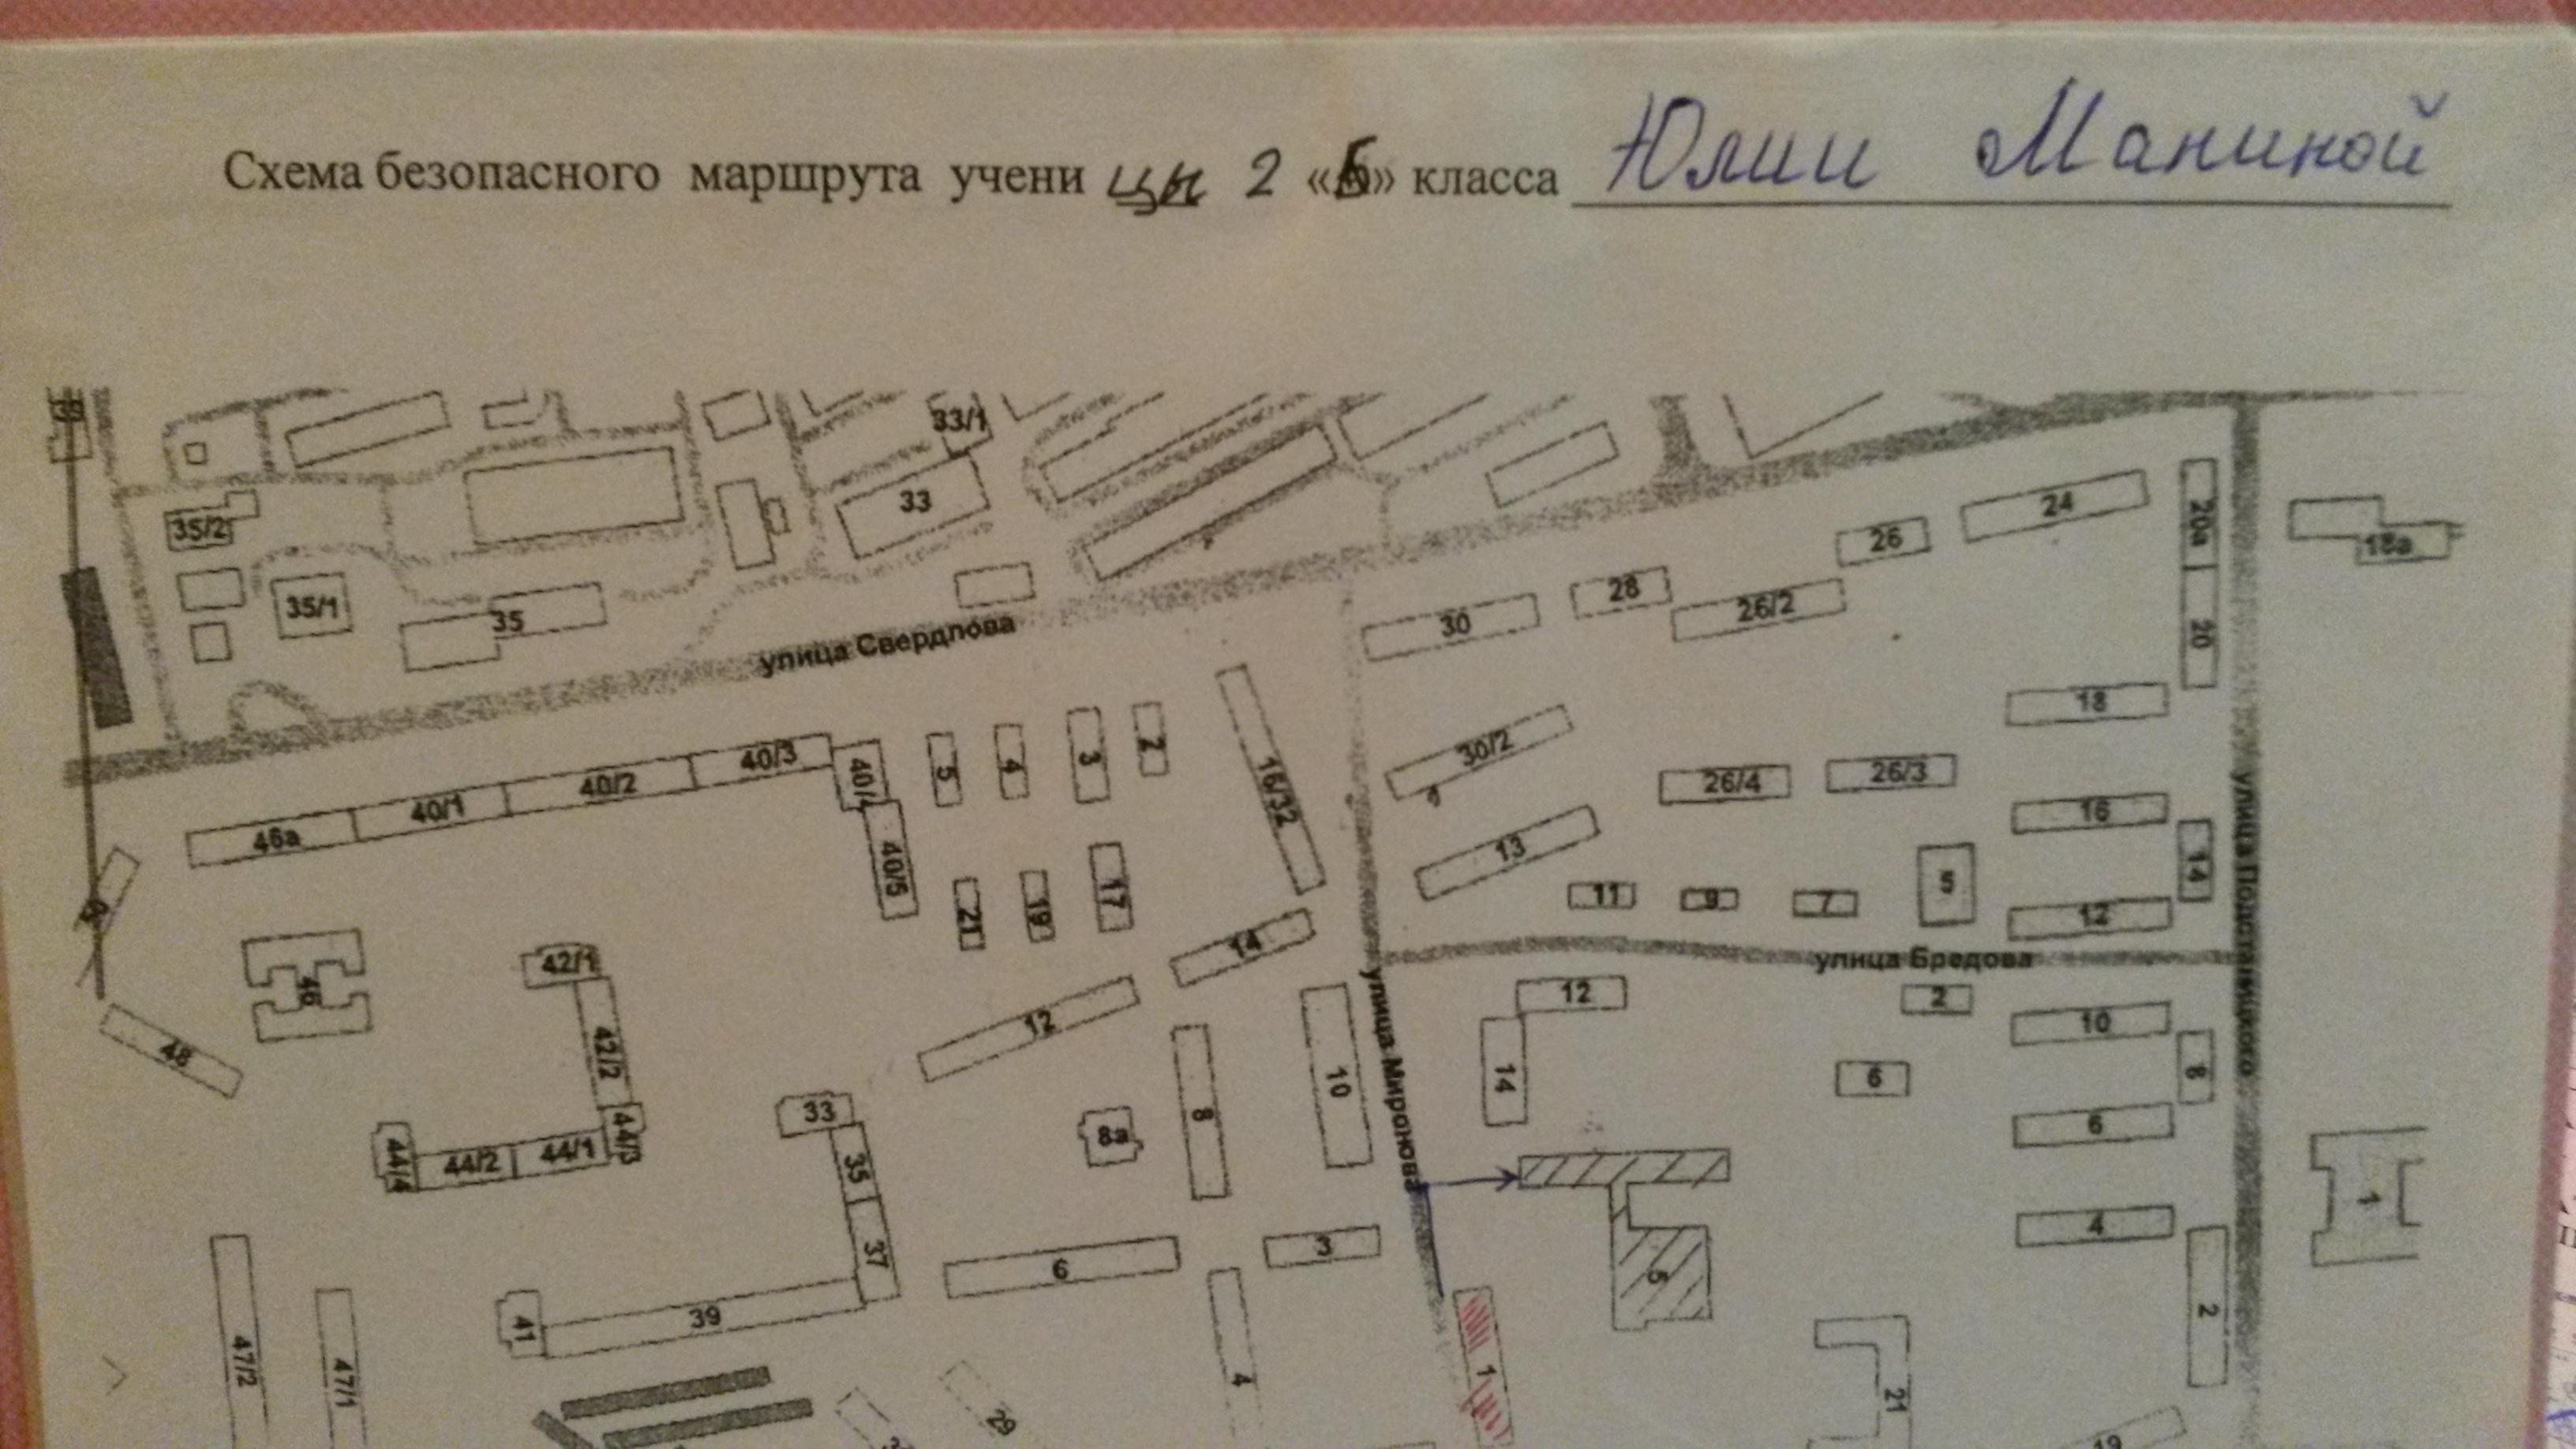 Рисуем схему безопасного маршрута от дома до школы